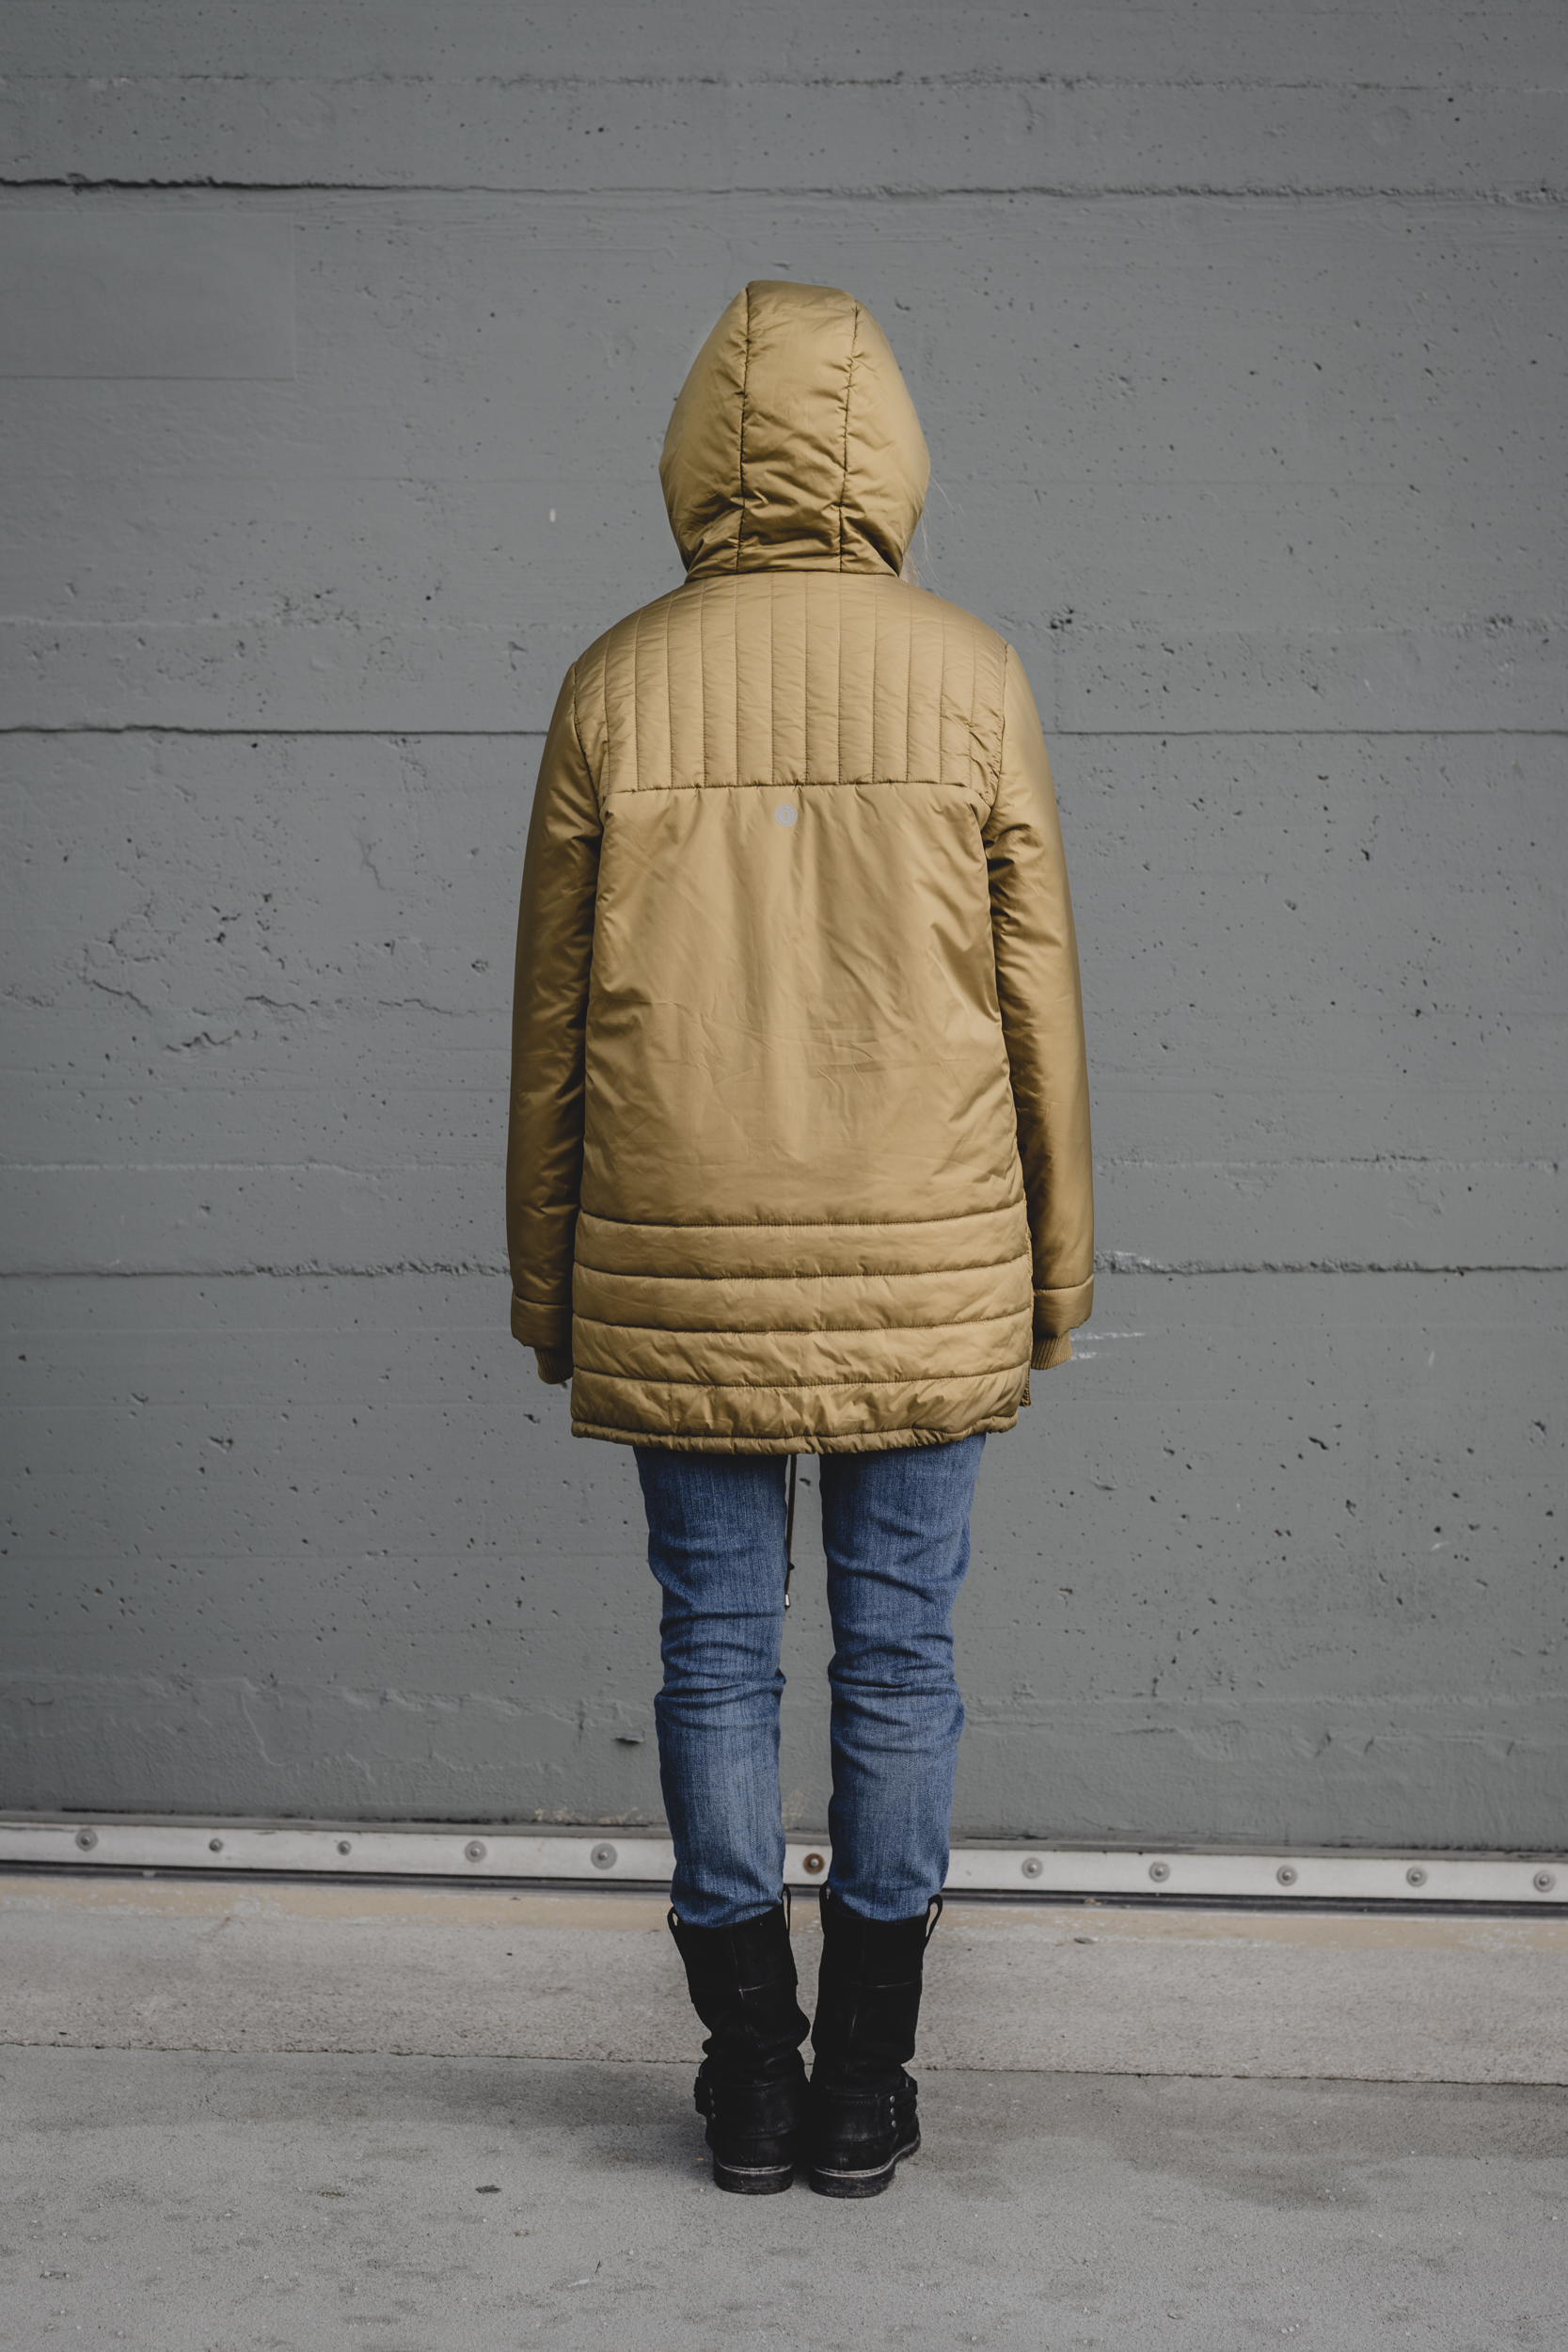 TT_fw2018_jackets_gsx5991.jpg